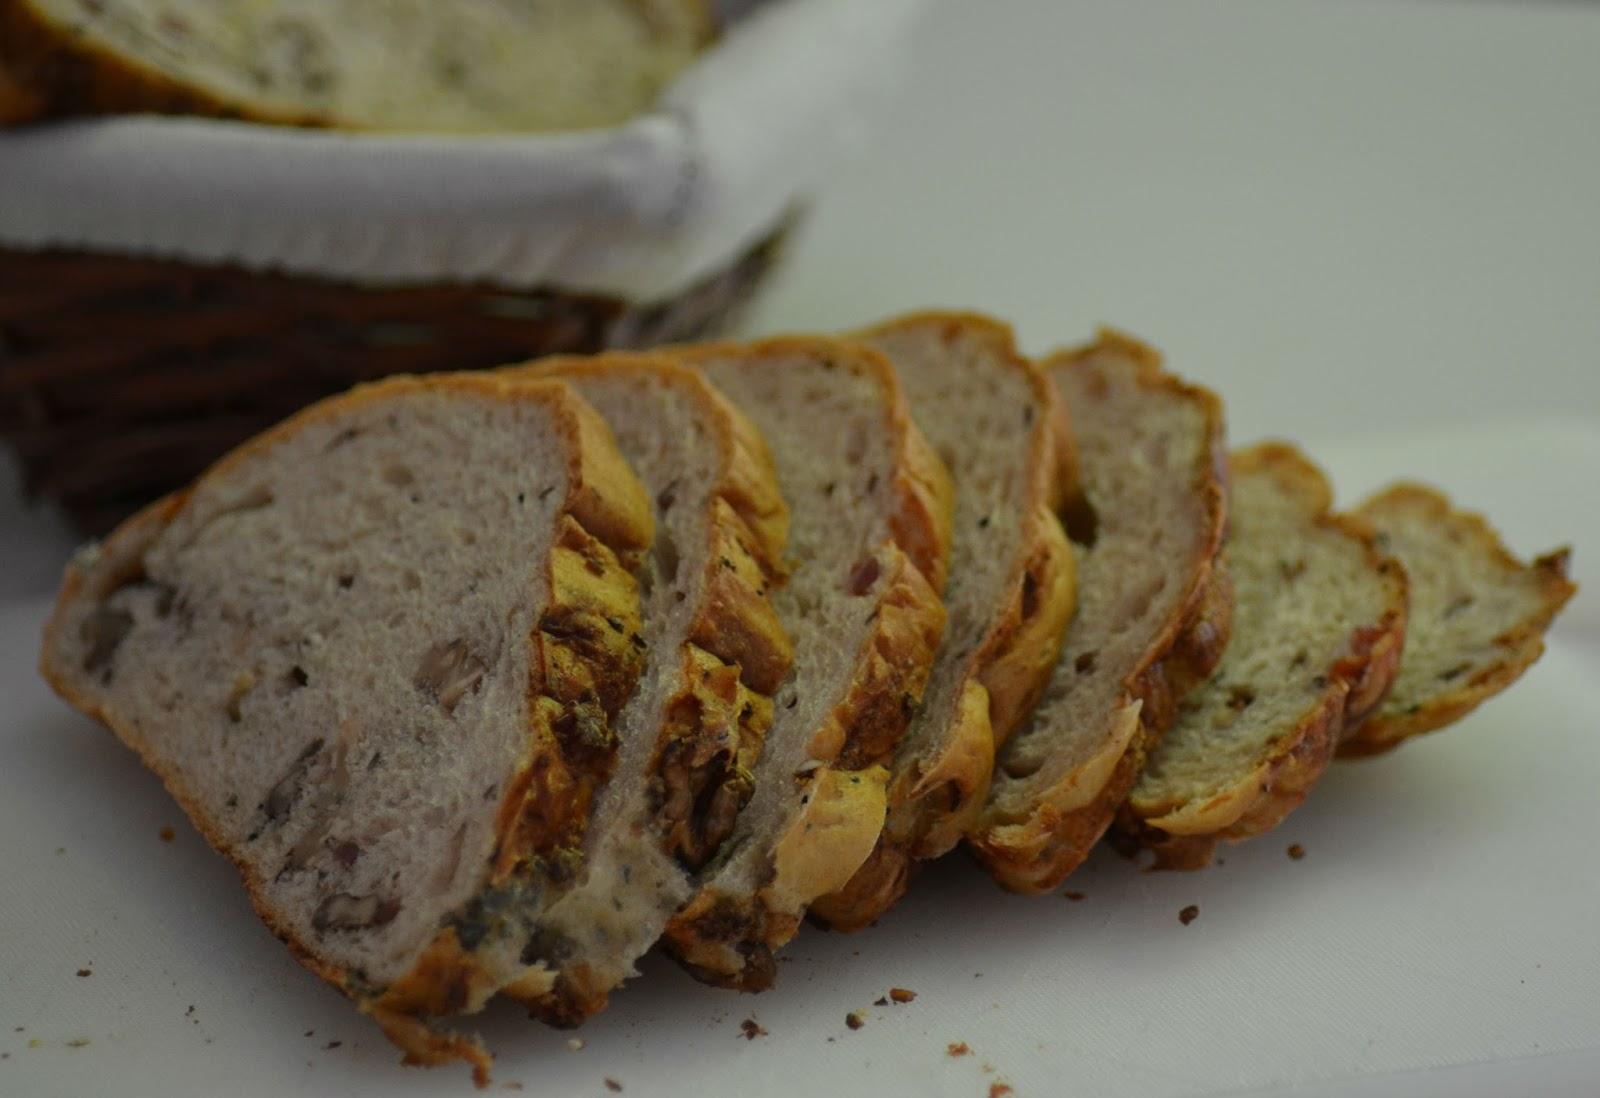 Hartig gevuld brood met blauwe kaas, walnoten, spekjes en salie